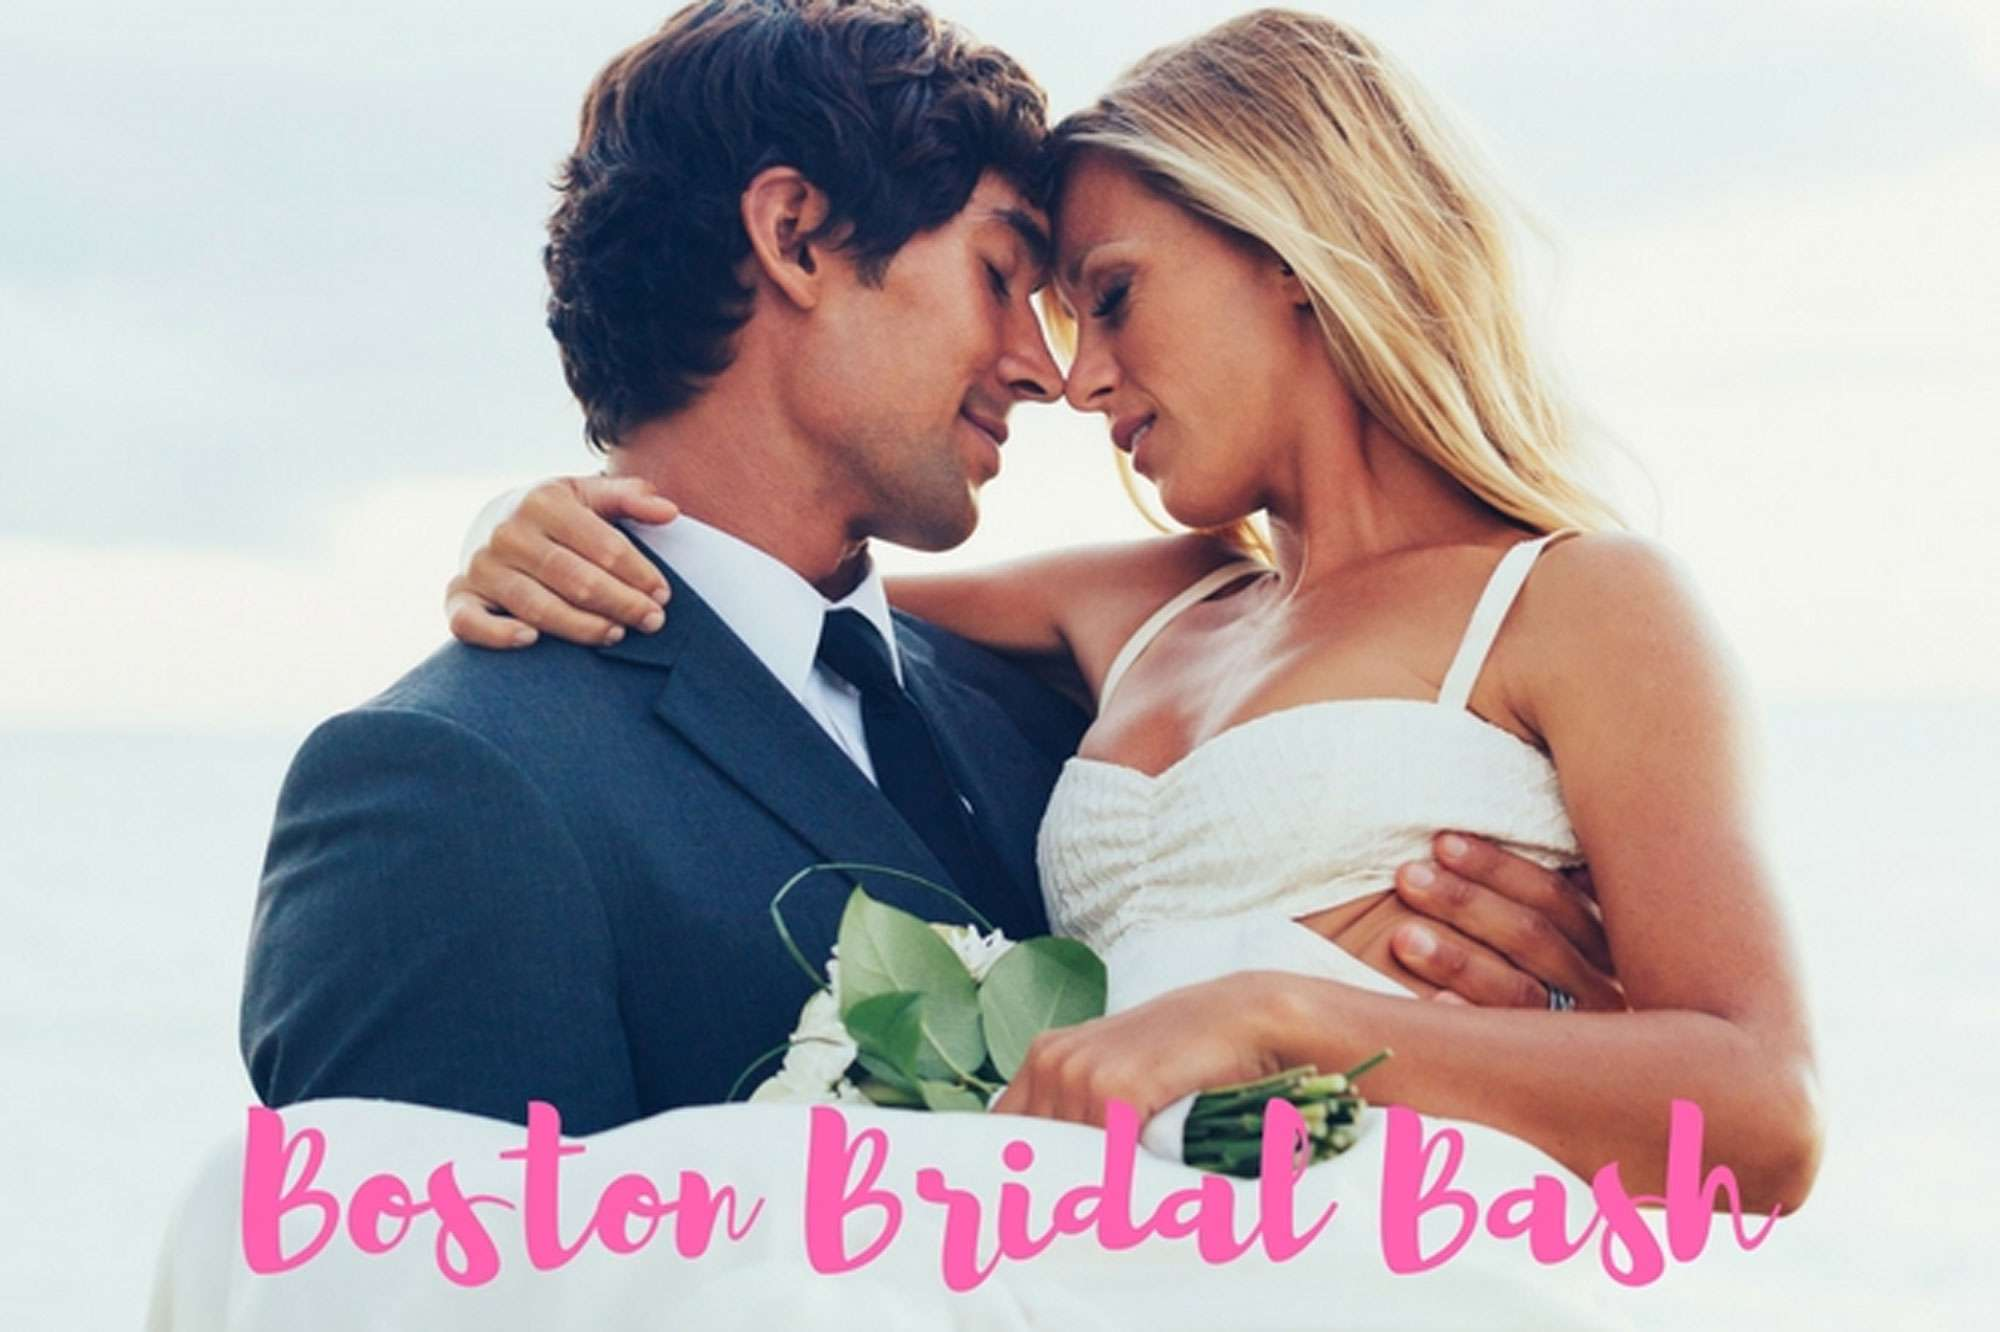 Boston Bridal Bash